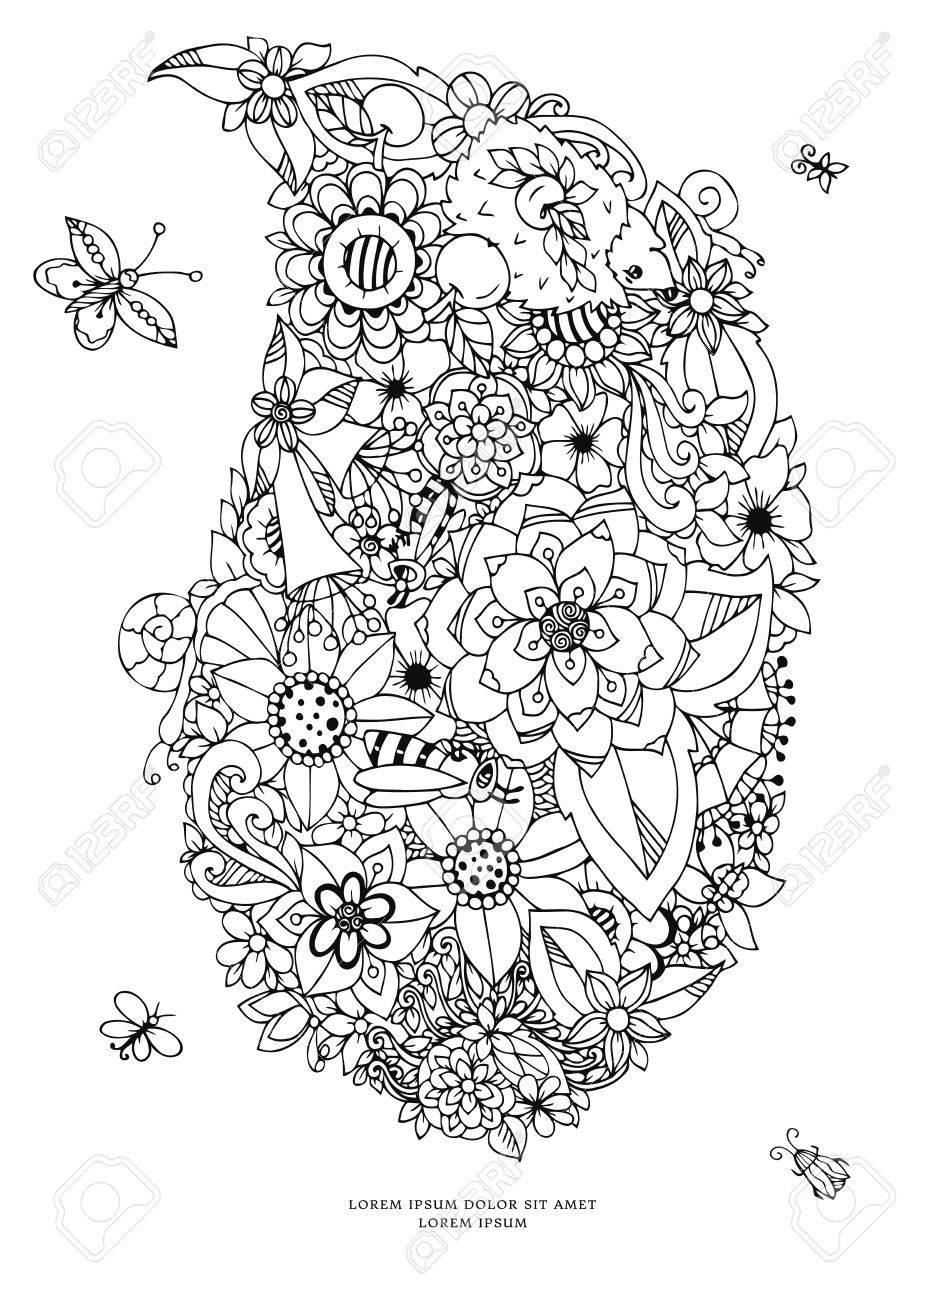 Vektor-Illustration Zentangl Karte Mit Blumen. Doodle Blumen ...